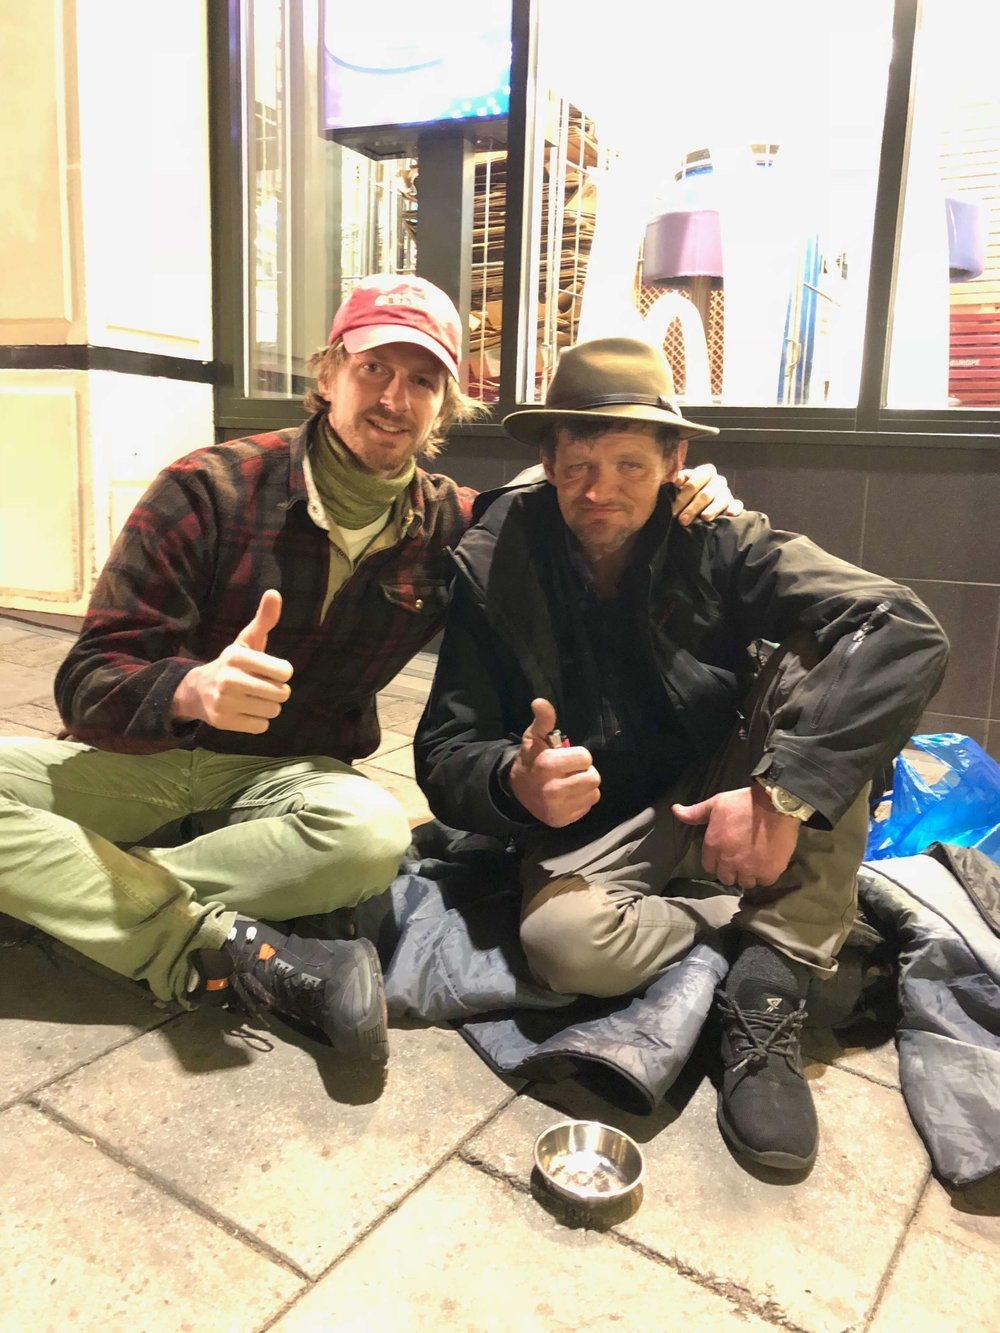 AndrewFunk_HomelessEntrepreneur_Windsor_todosdurmiendoenlacalle.jpg